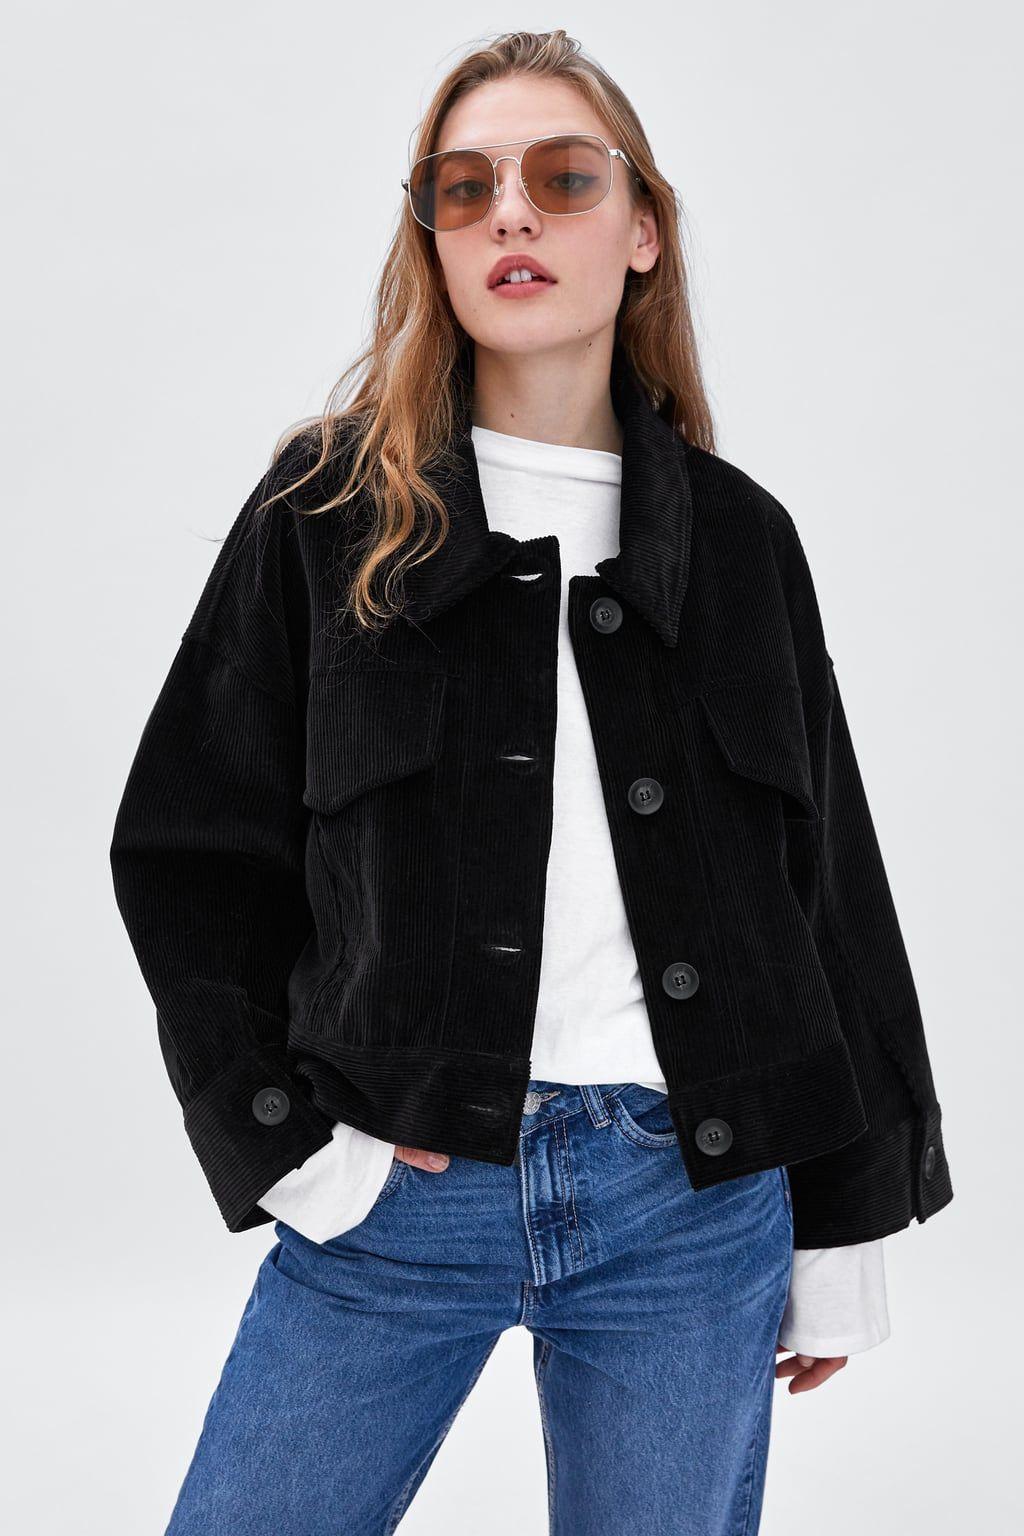 bae6594750 Corduroy jacket in 2019   The Best of Zara   Jackets, Corduroy ...